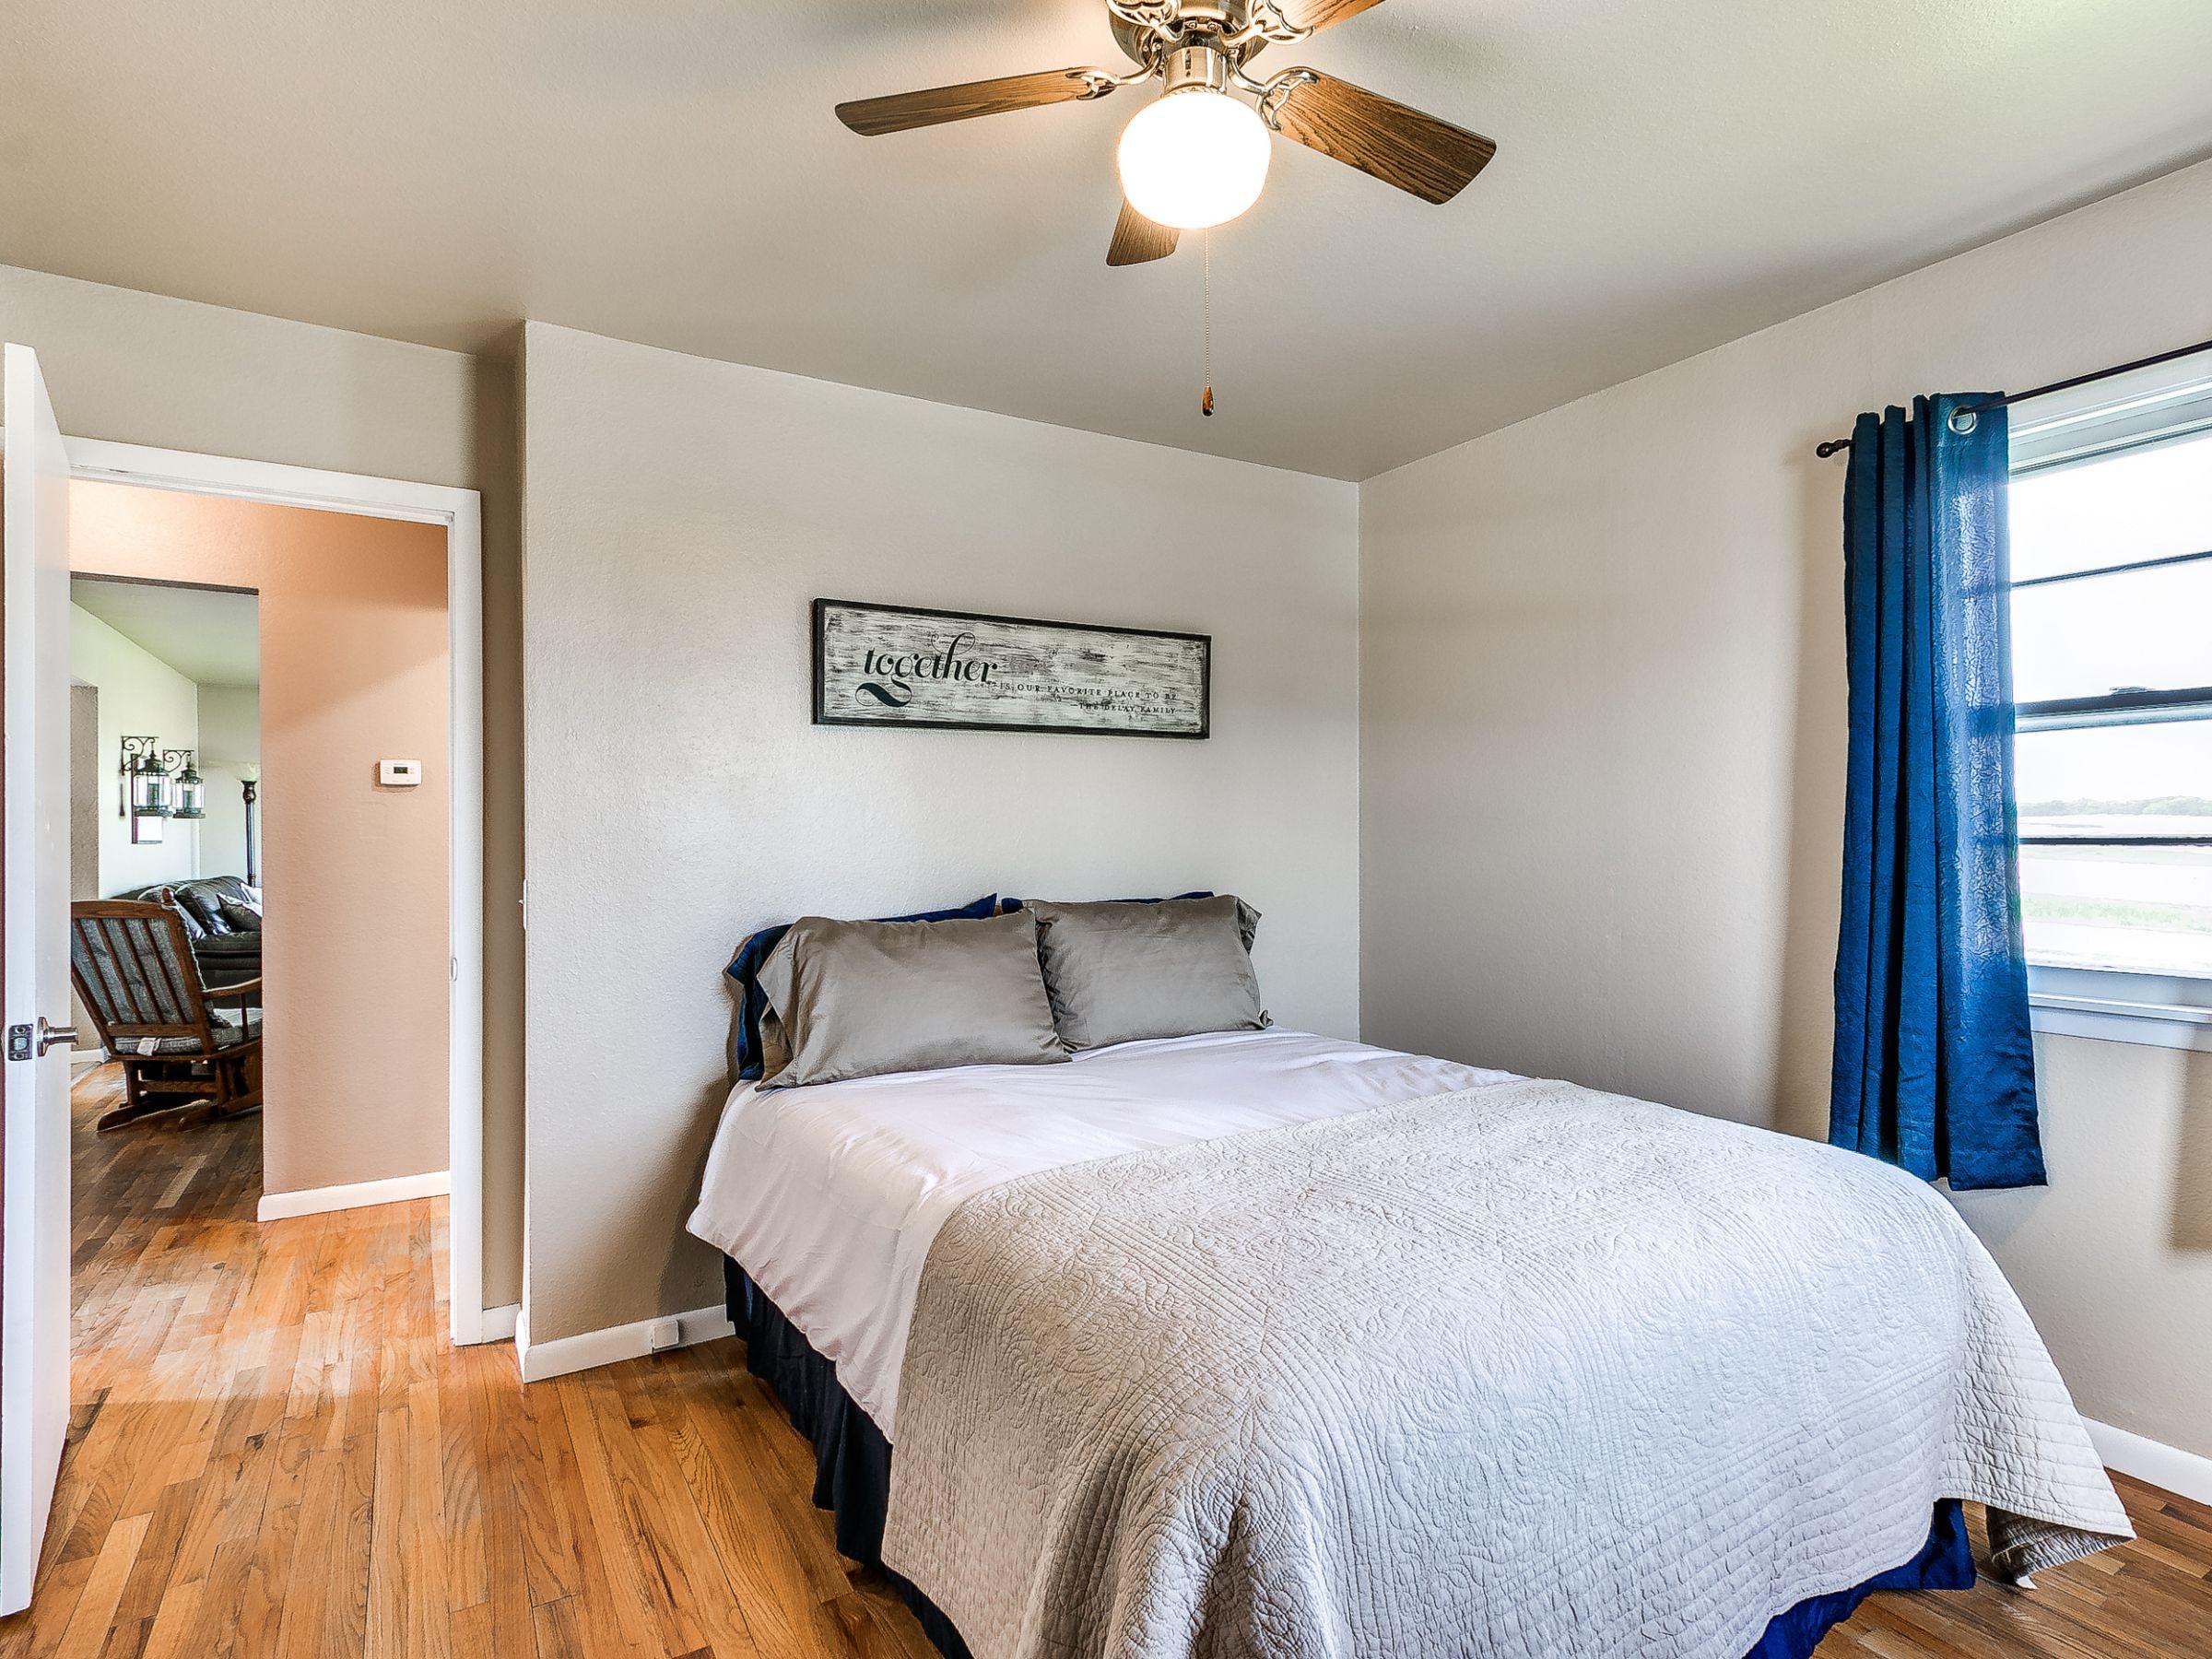 residential-warren-county-iowa-3-acres-listing-number-15516-8-2021-05-12-144934.jpg